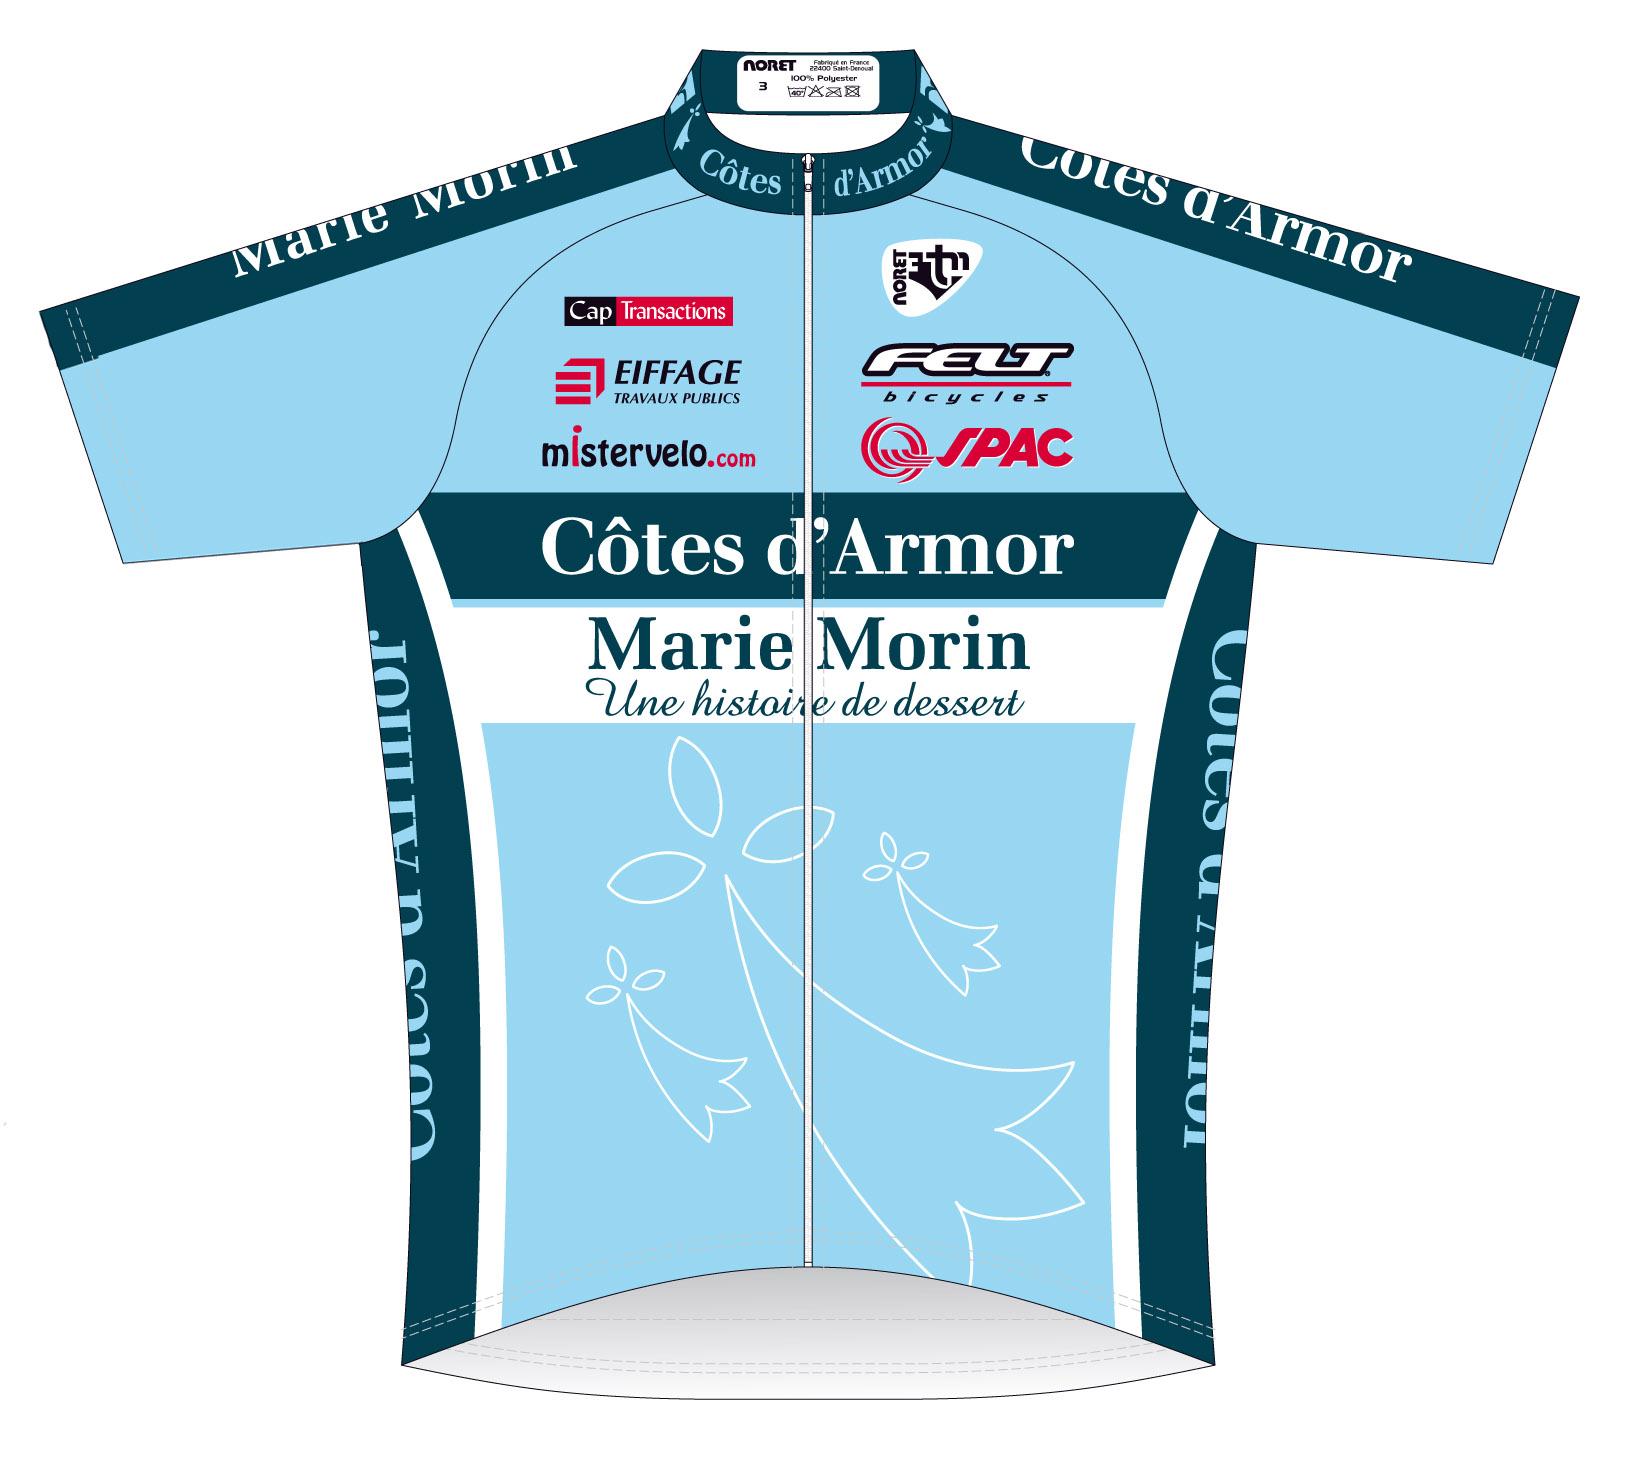 Côtes d'Armor-Marie Morin : Le maillot 2012